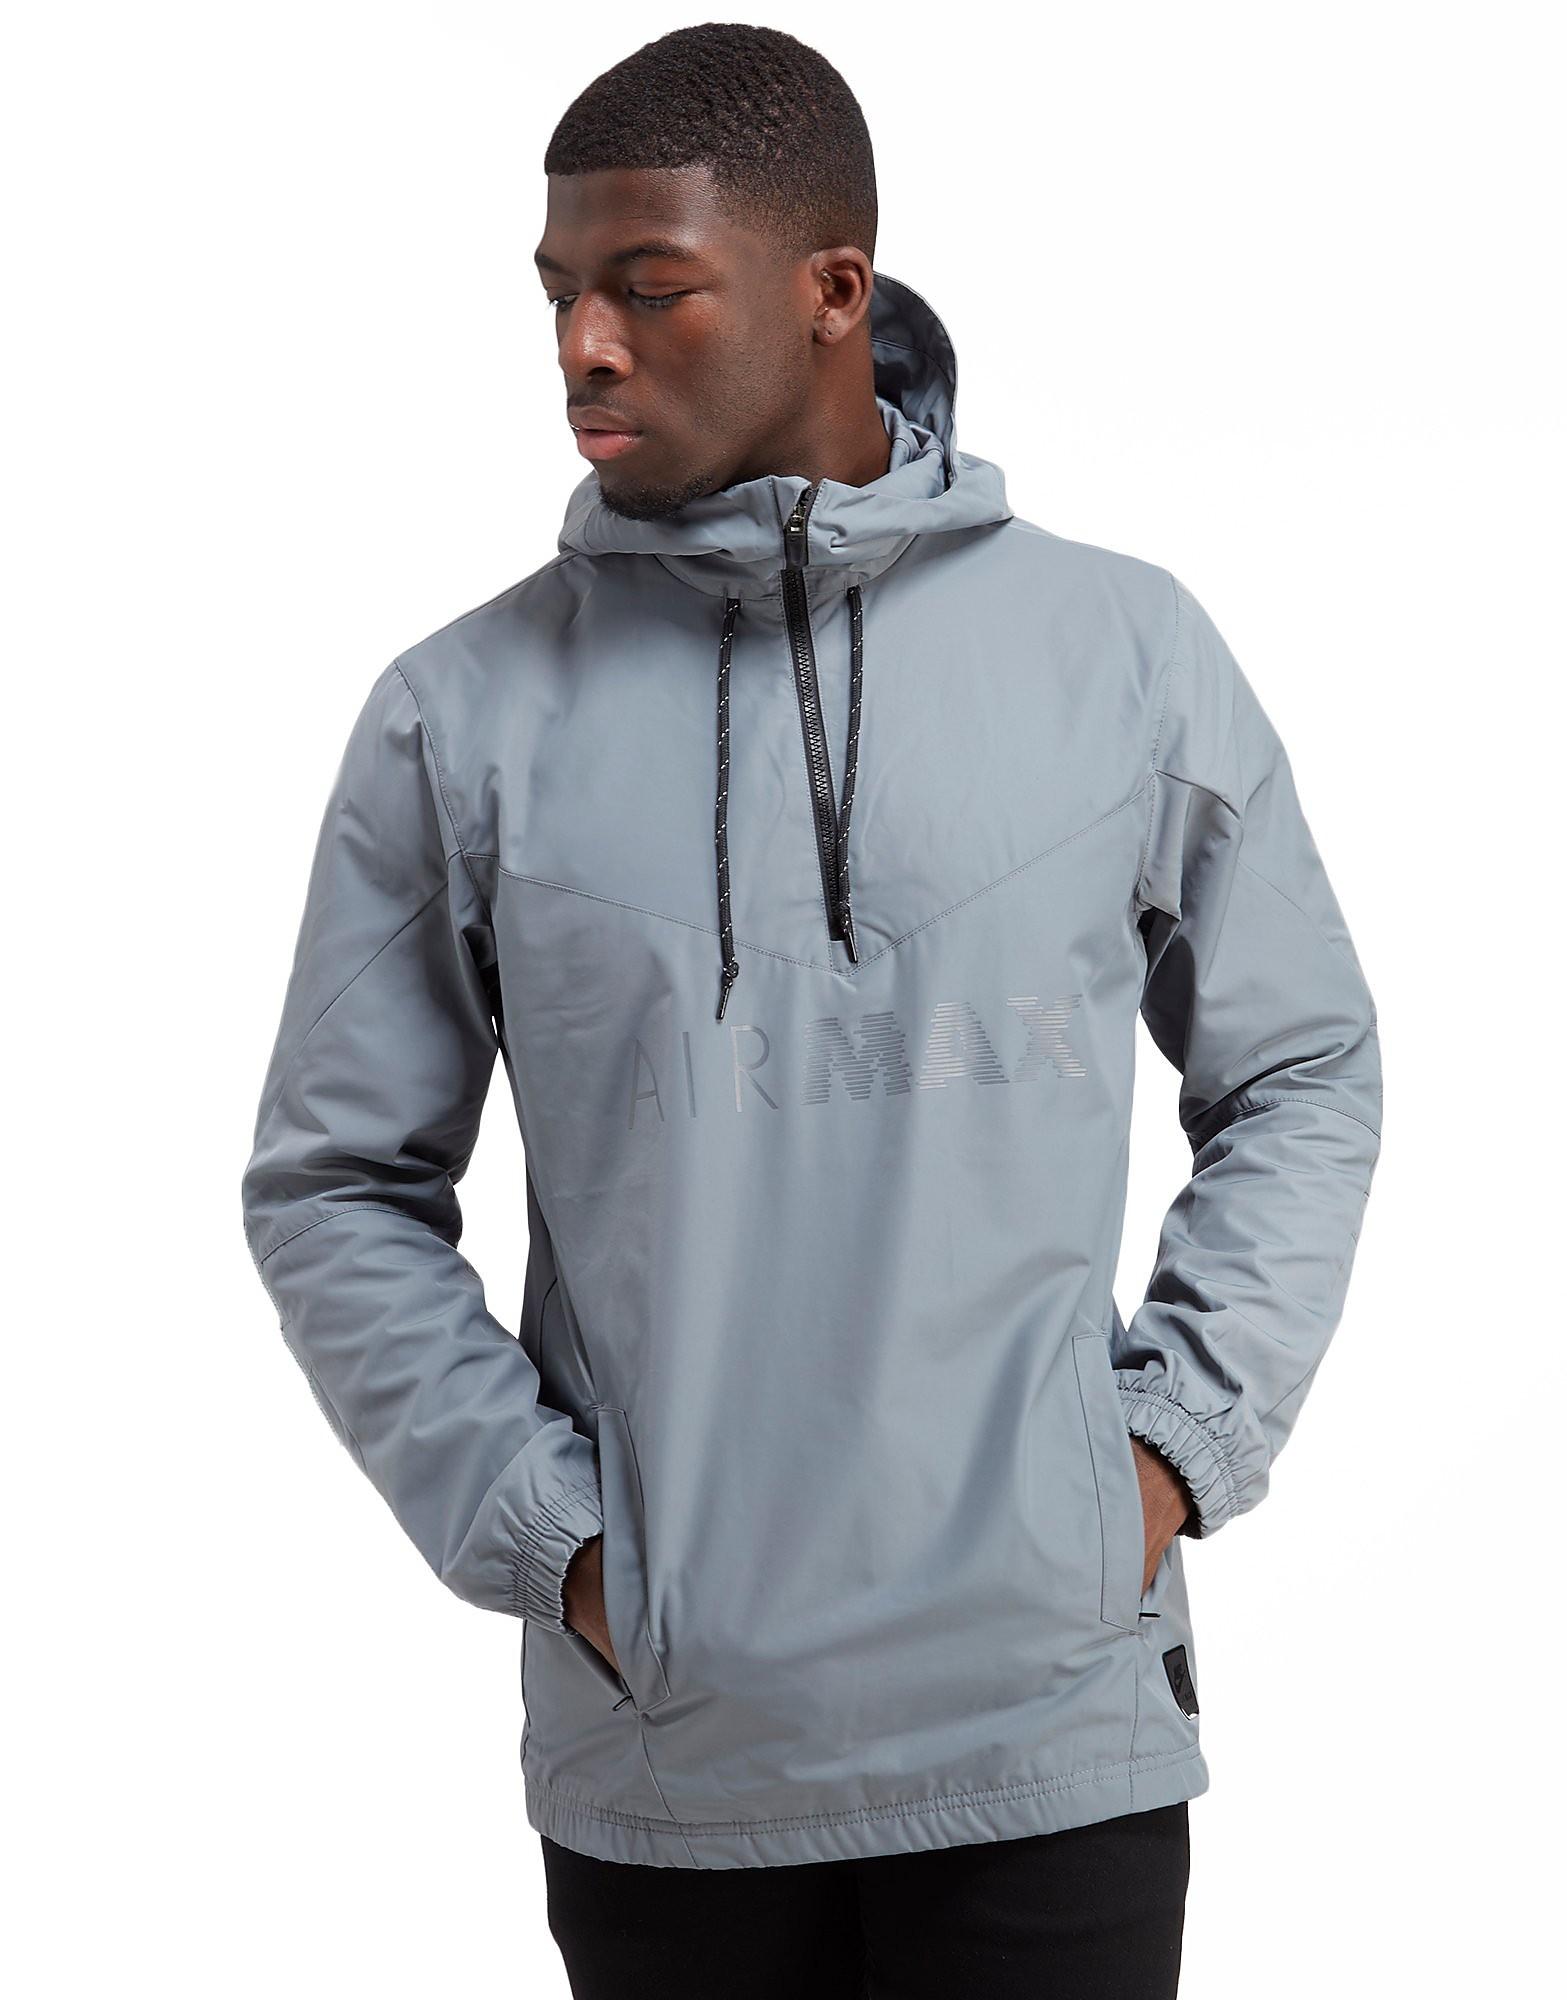 Nike Air Max Half Zip Chevron Jacket